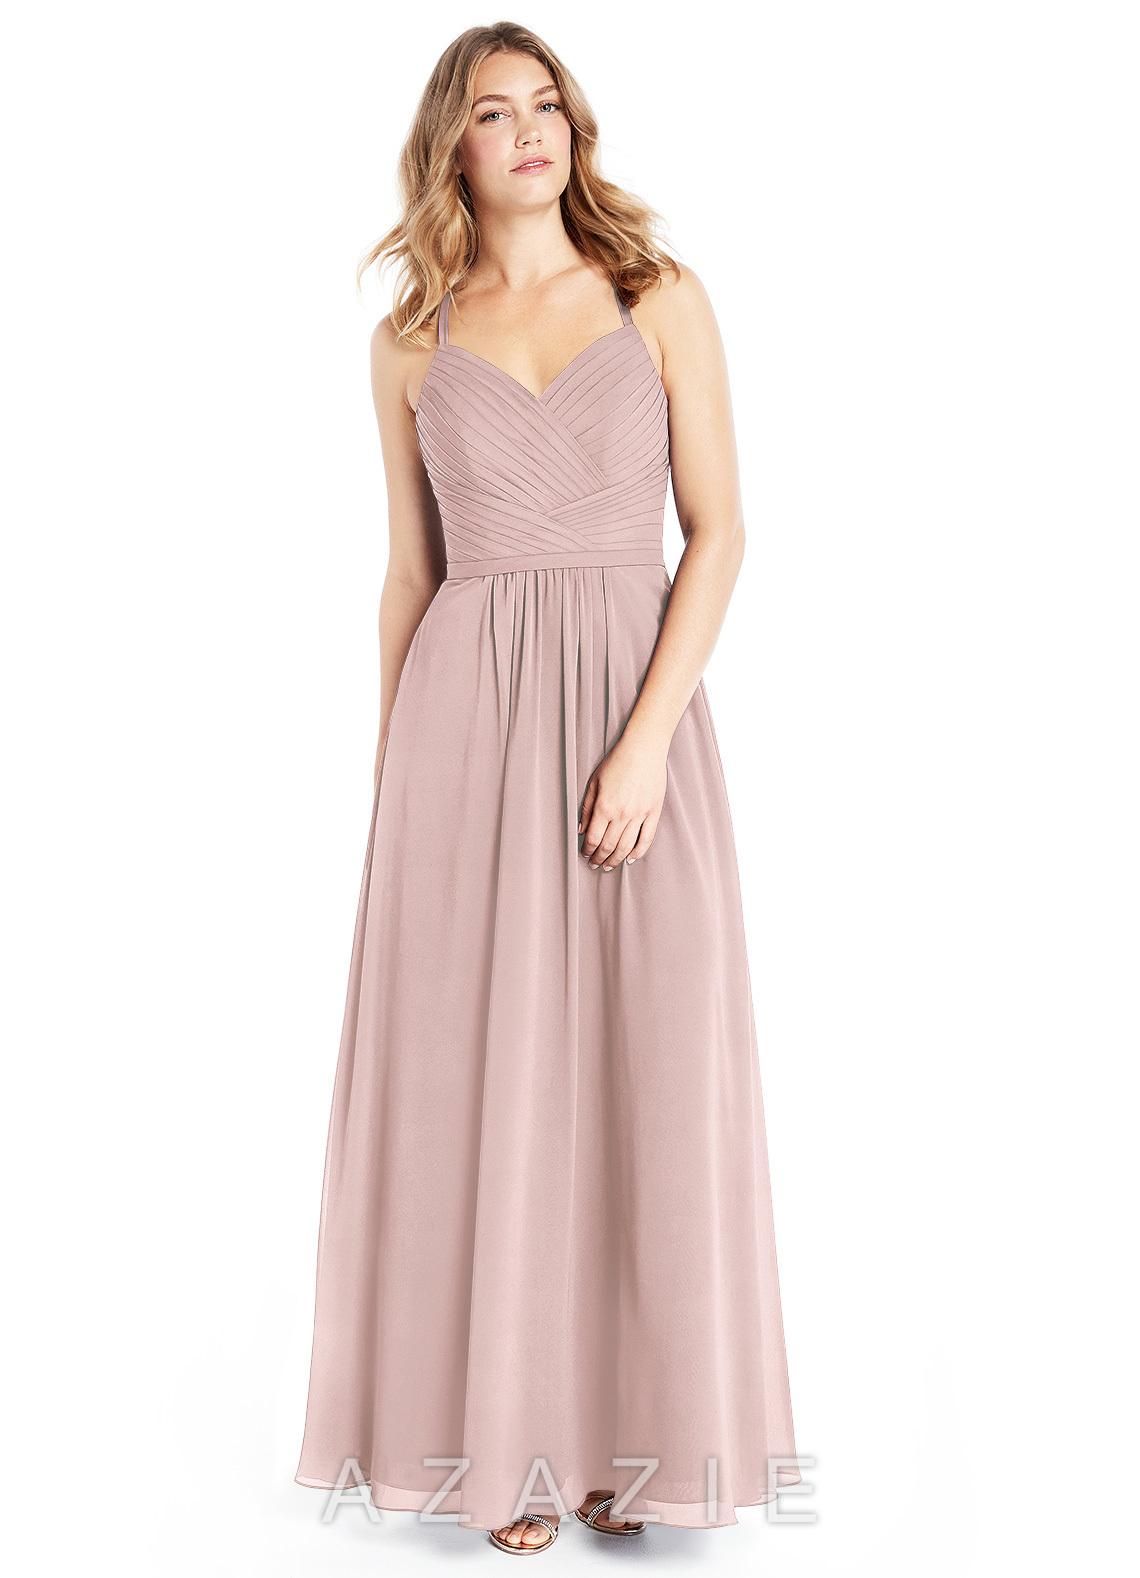 9e5f71ed4bd Azazie Amari Bridesmaid Dresses